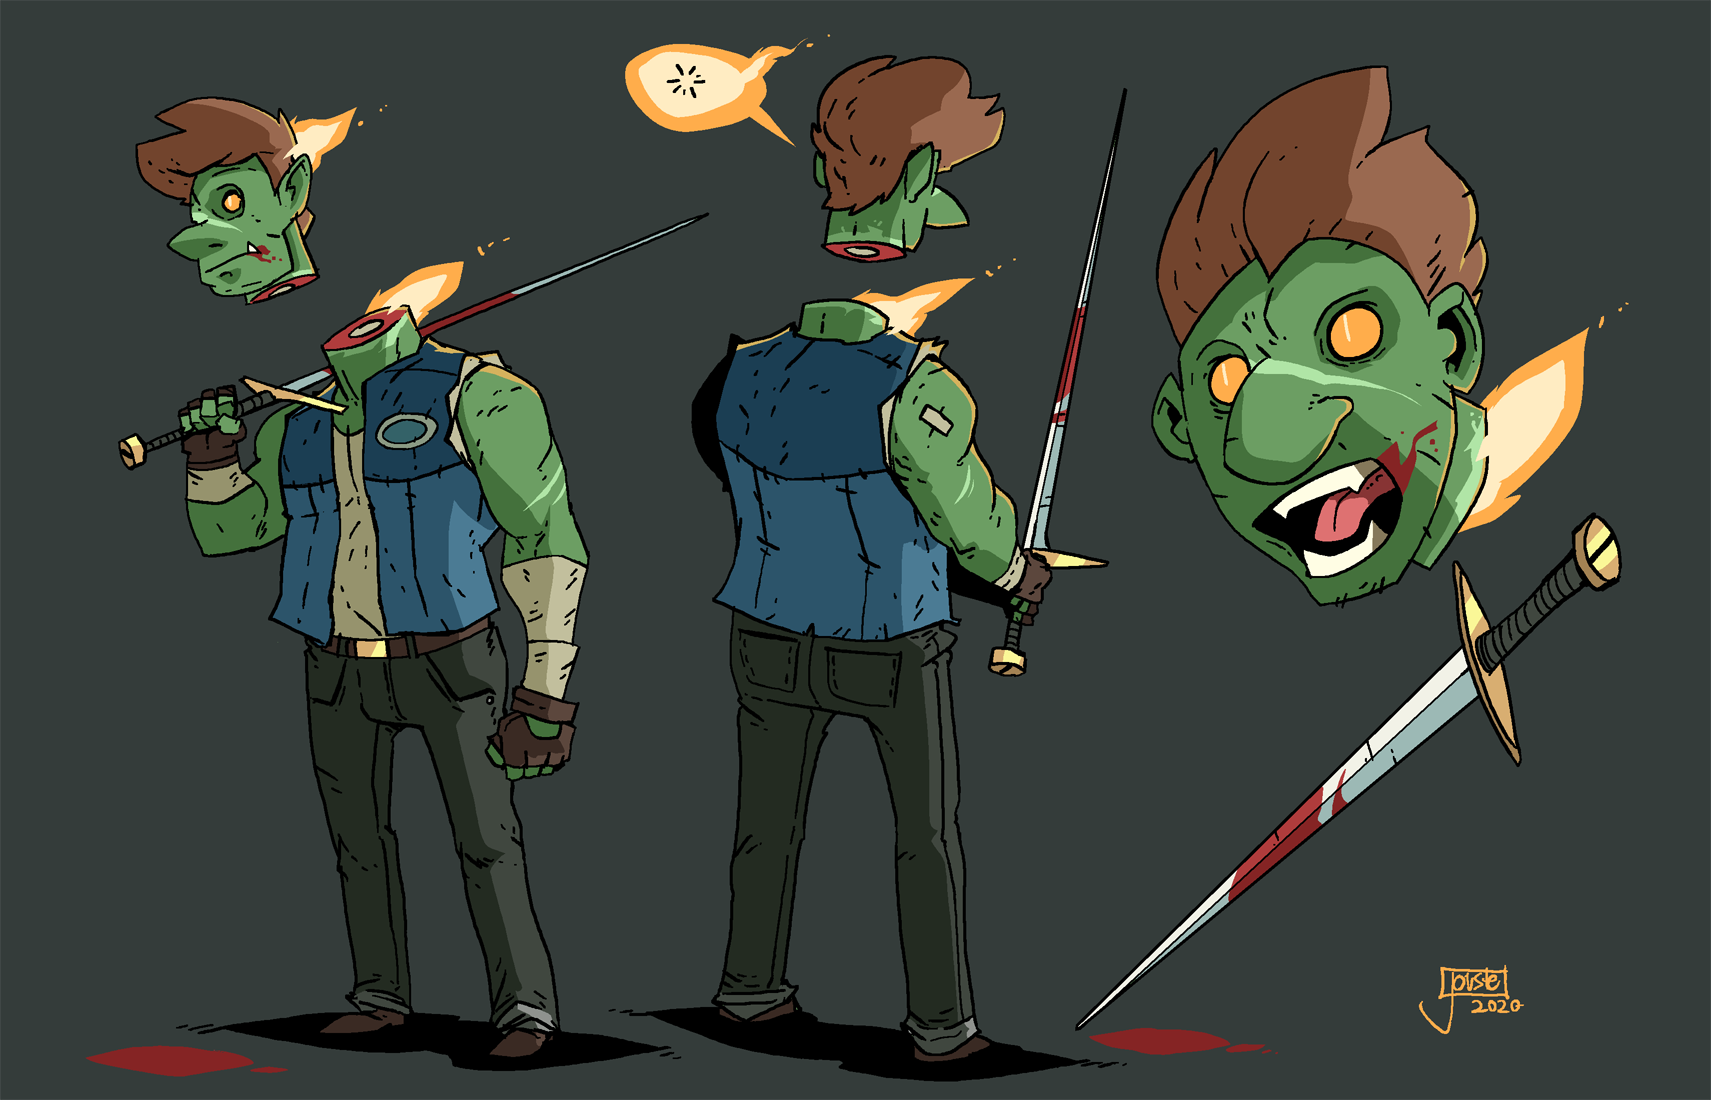 The Headless Swordsman